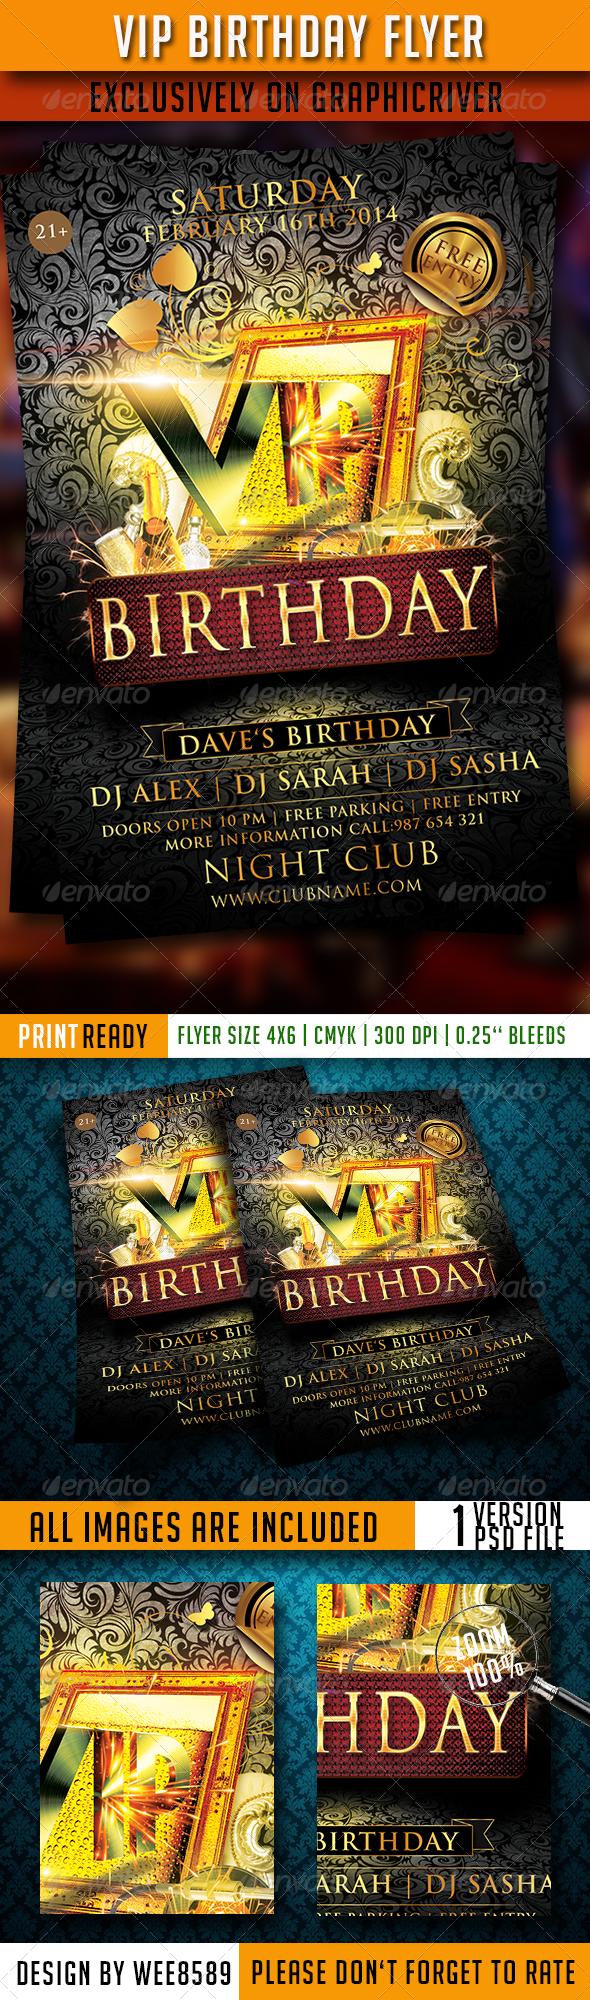 VIP Birthday Flyer Template